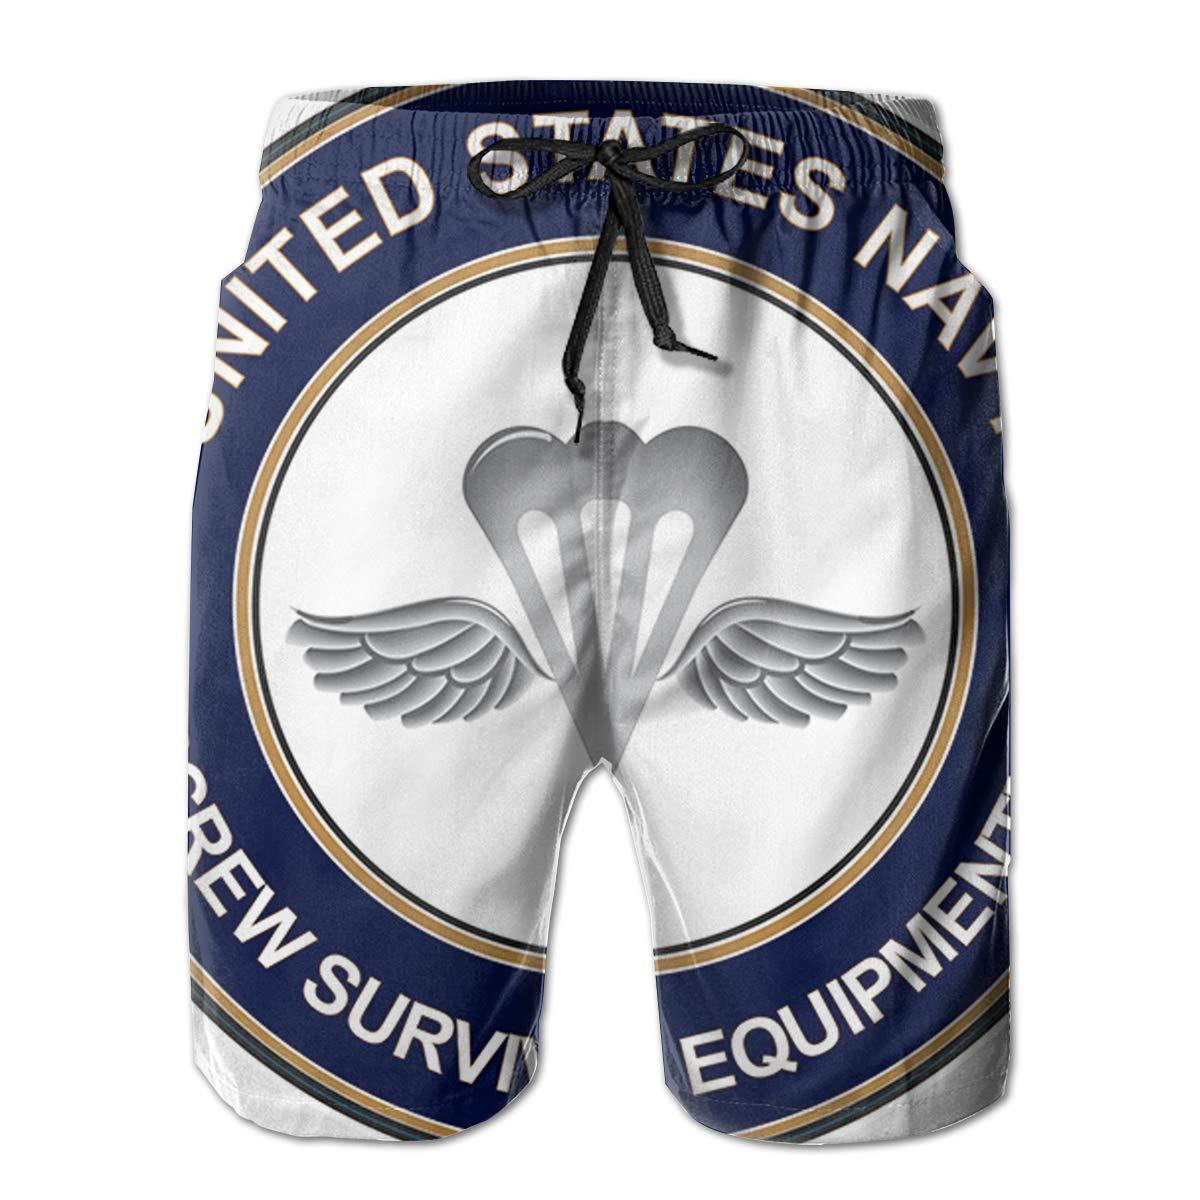 Reality And Ideals US Navy Aircrew Survival Equipmentman AZ Mens Swim Trunks Board Shorts